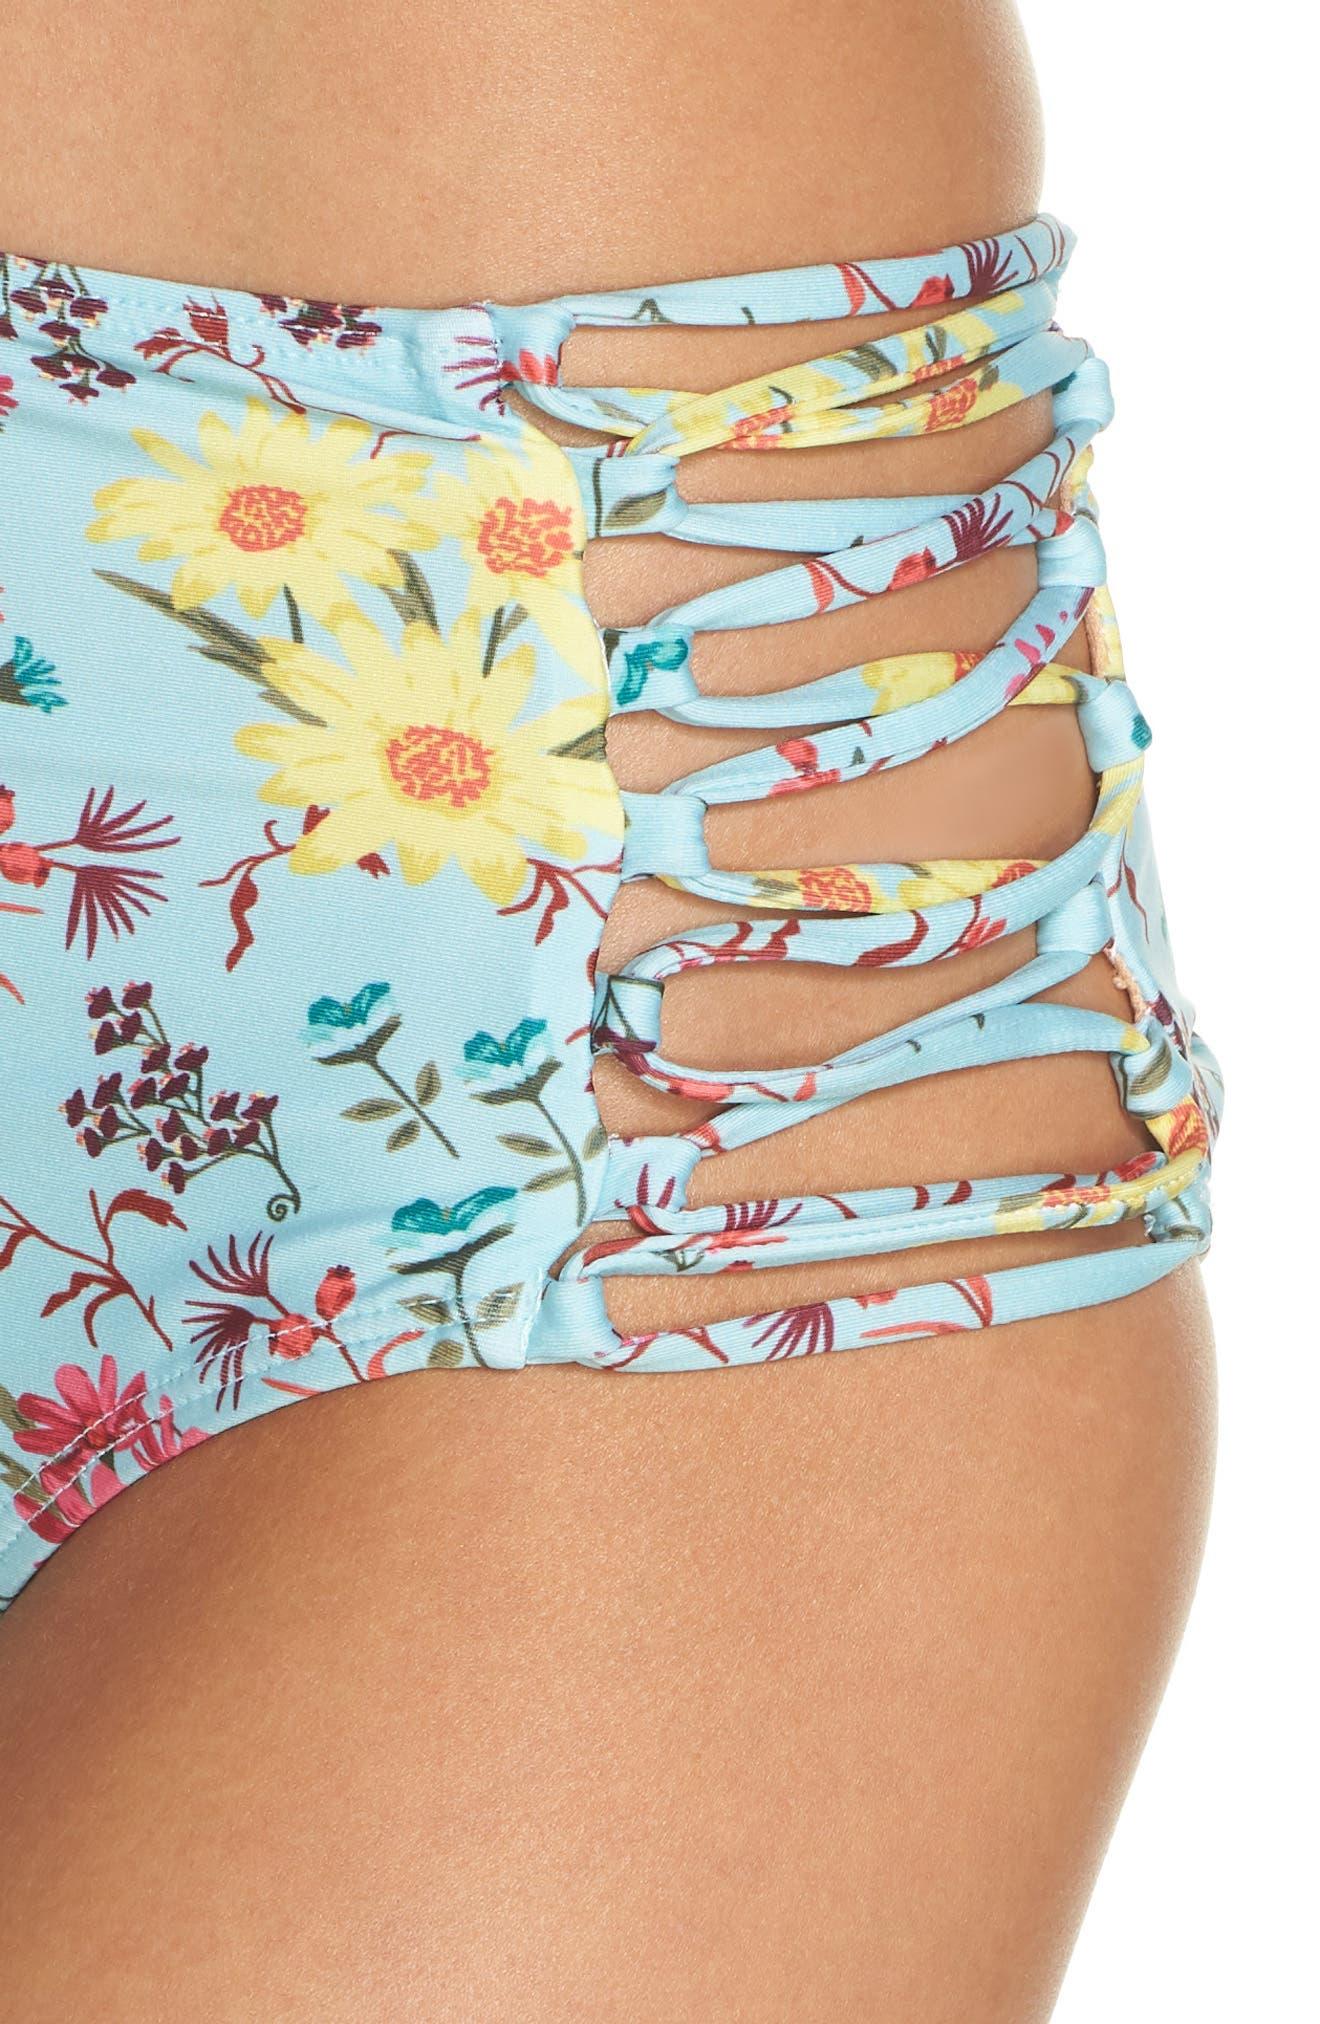 Stripe High Waist Bikini Bottoms,                             Alternate thumbnail 4, color,                             Teal Eggshell